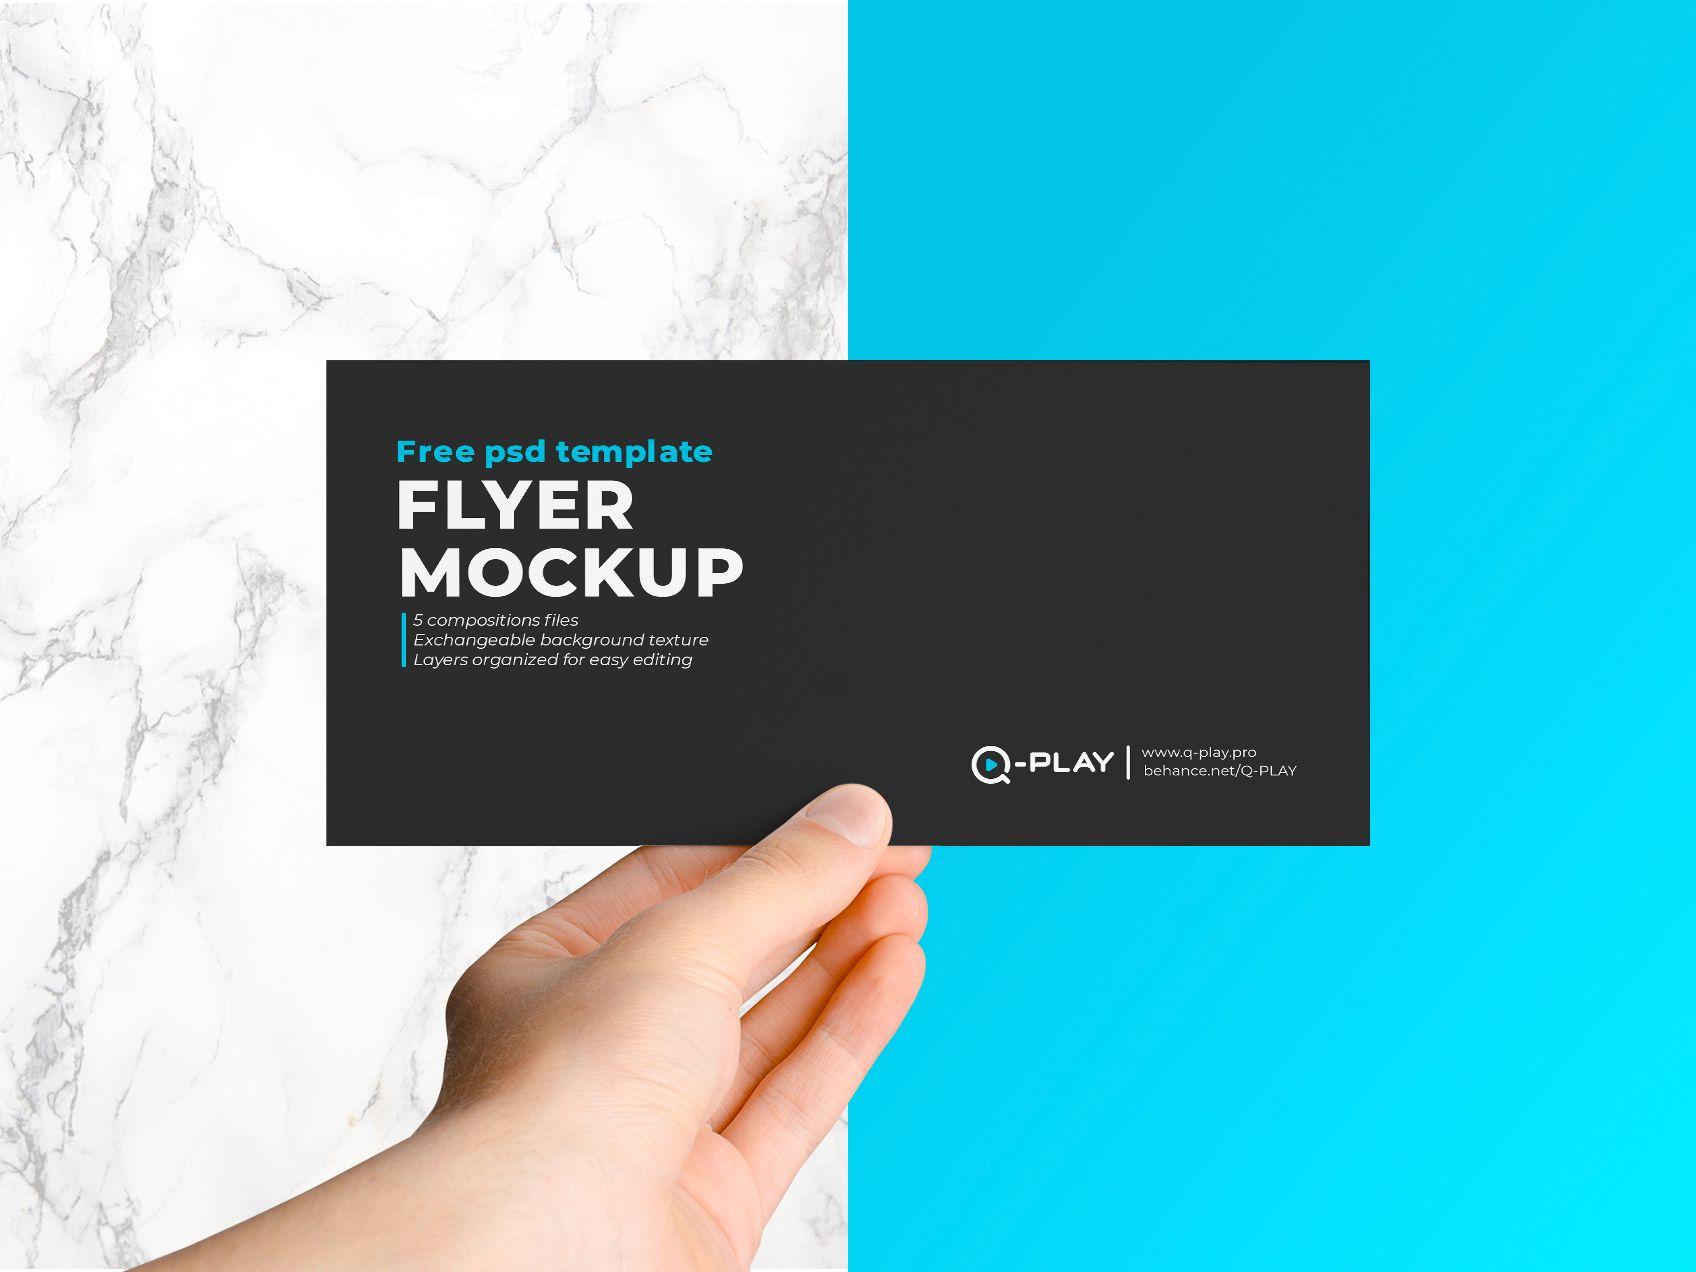 Flyer Mockup In 2021 Flyer Mockup Flyer Business Card Template